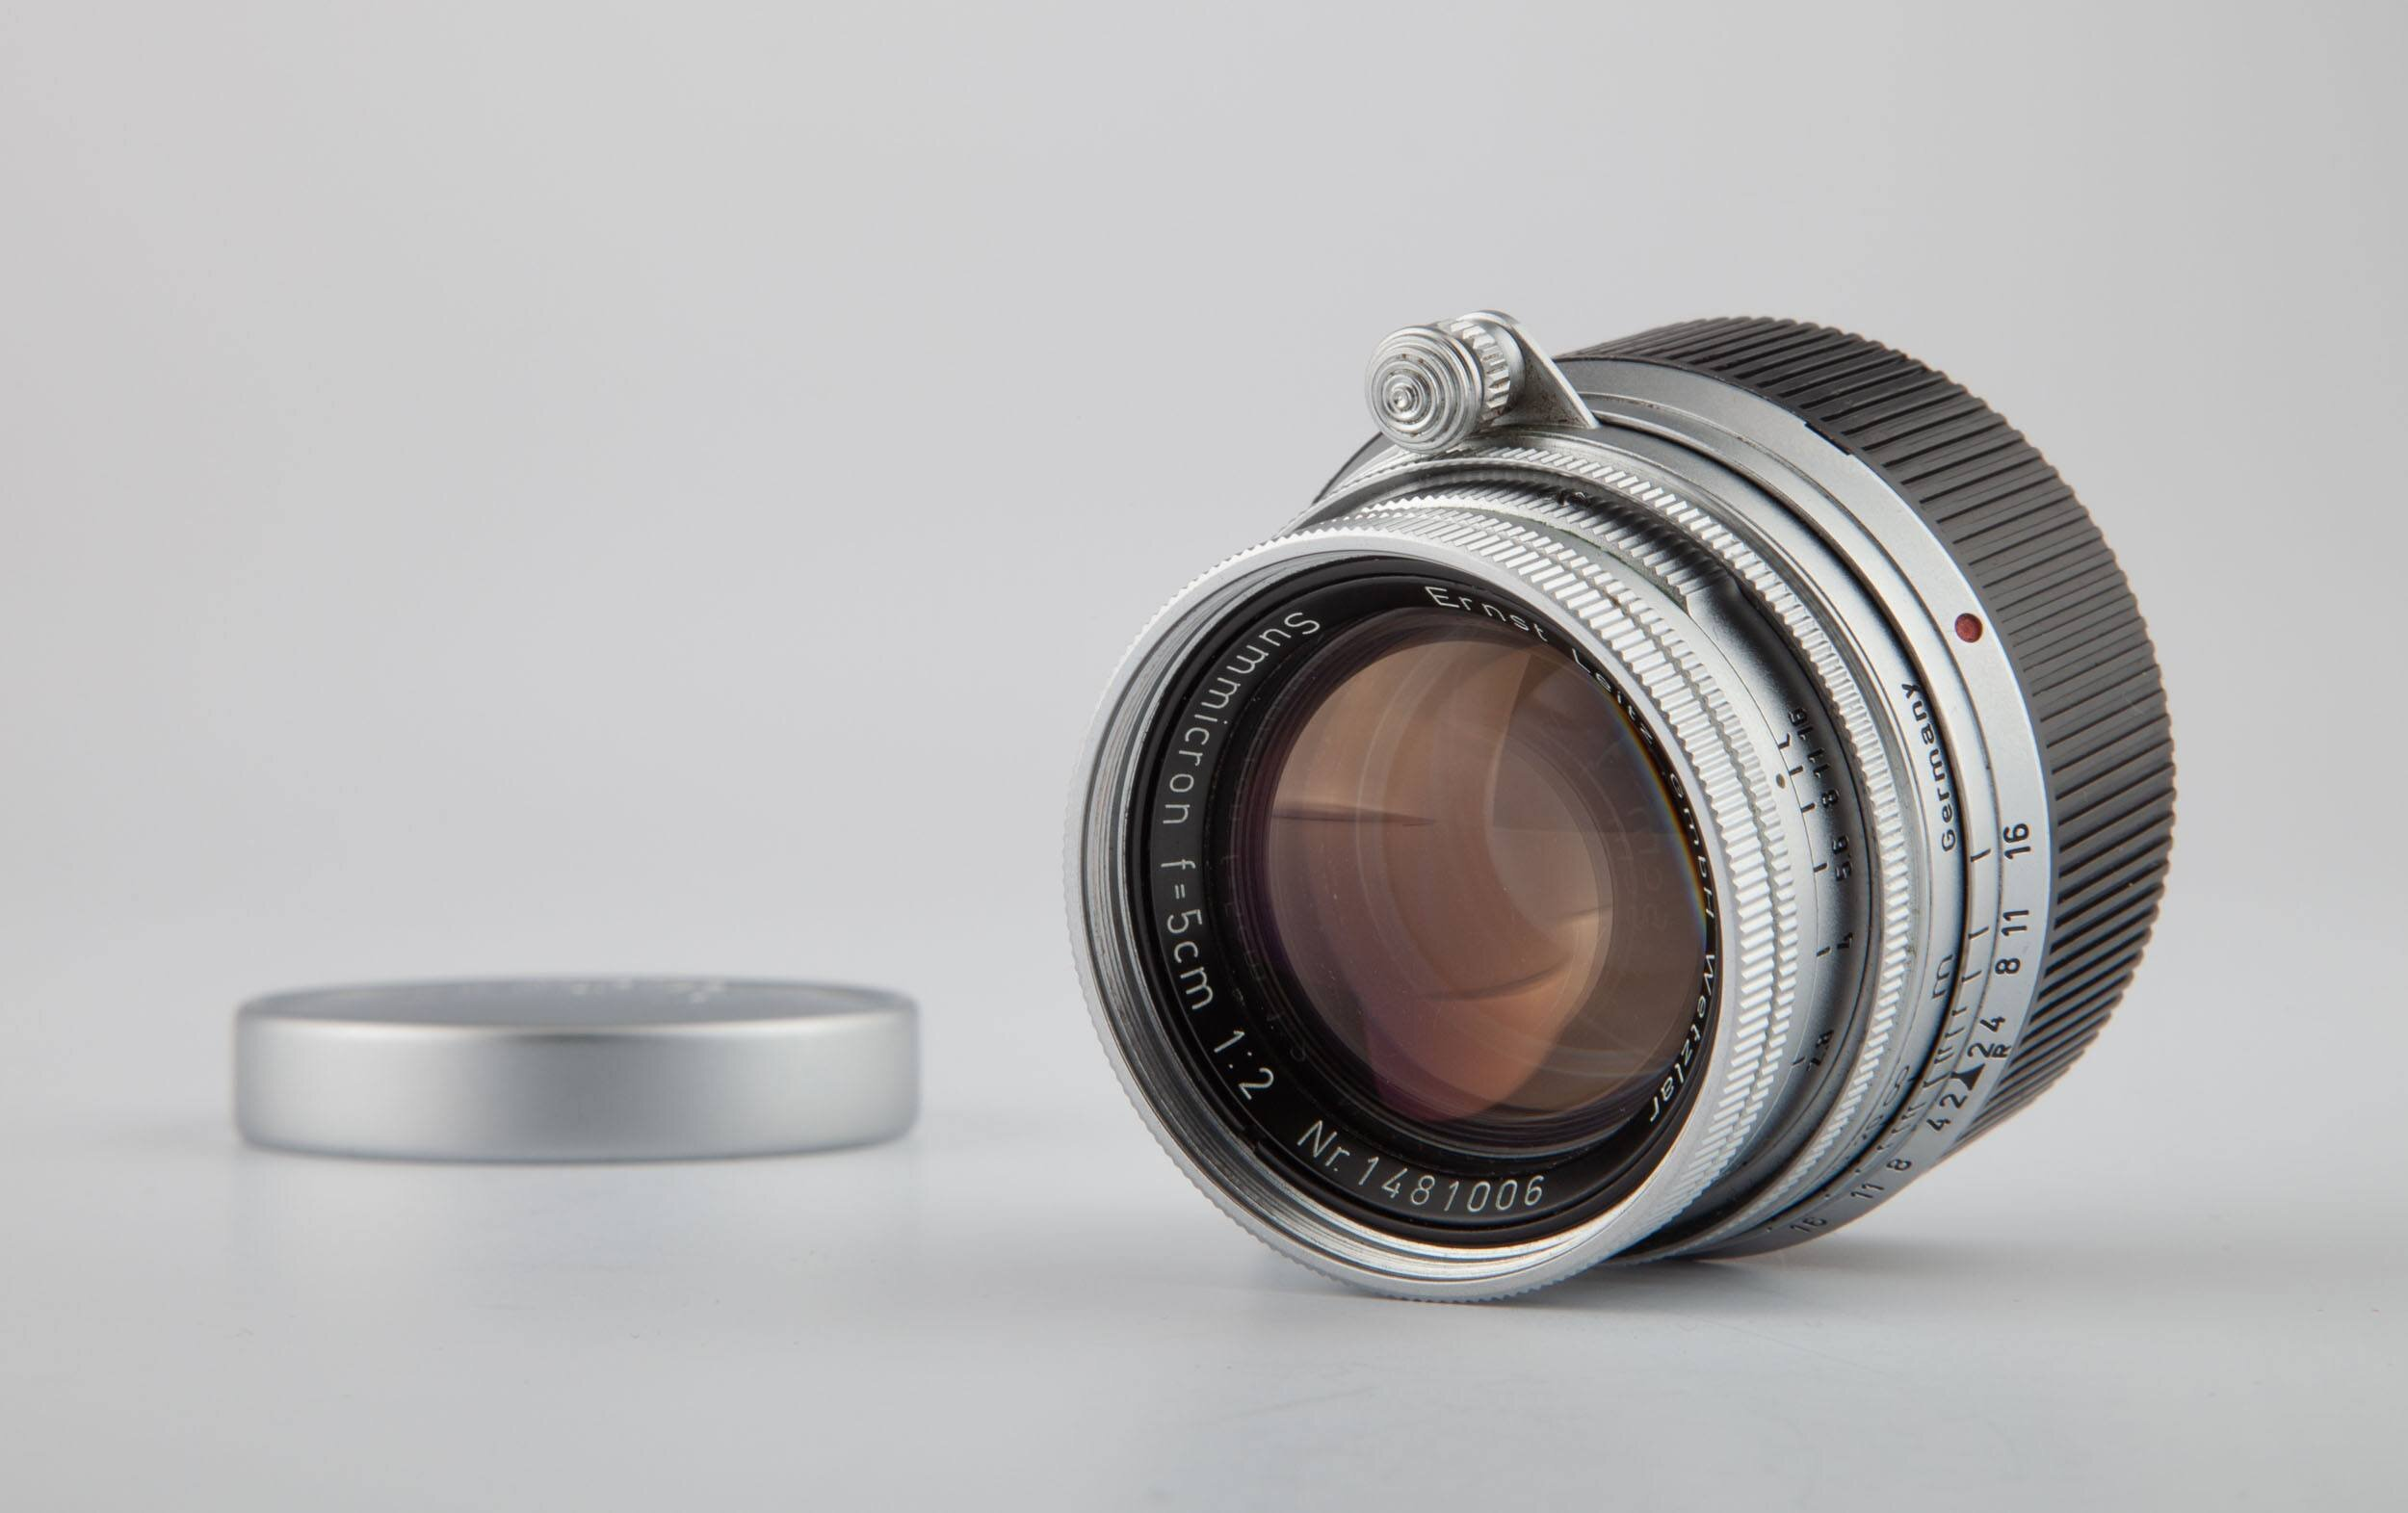 Leica Summicron-M F2 50mm chrom collapsable